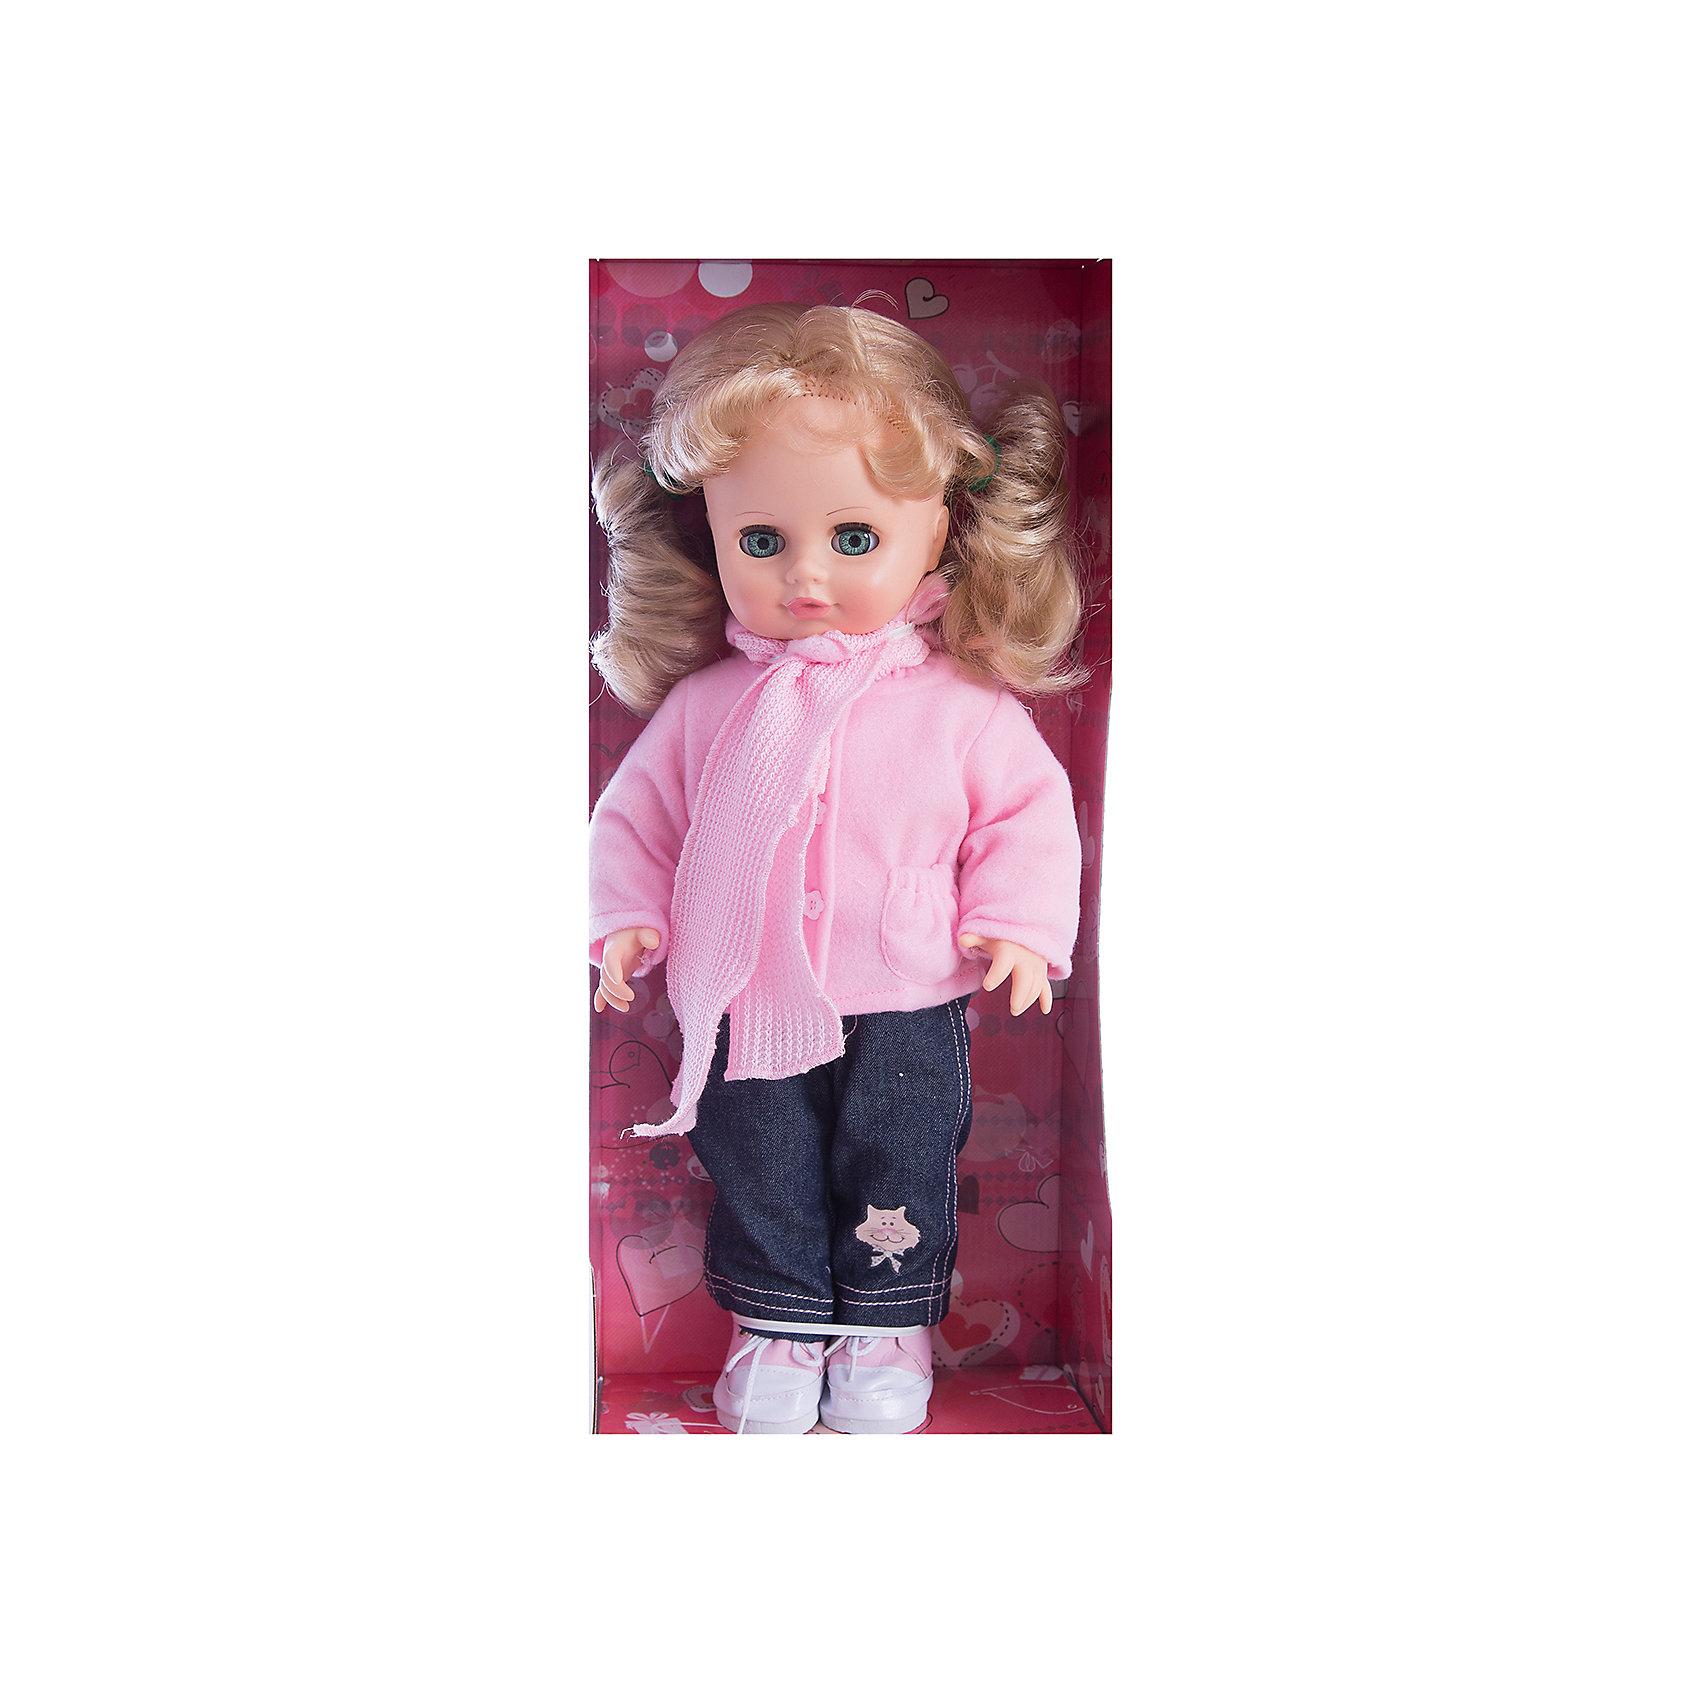 Весна Кукла Инна 38, со звуком, Весна кукла весна алсу 35 см со звуком в1634 о